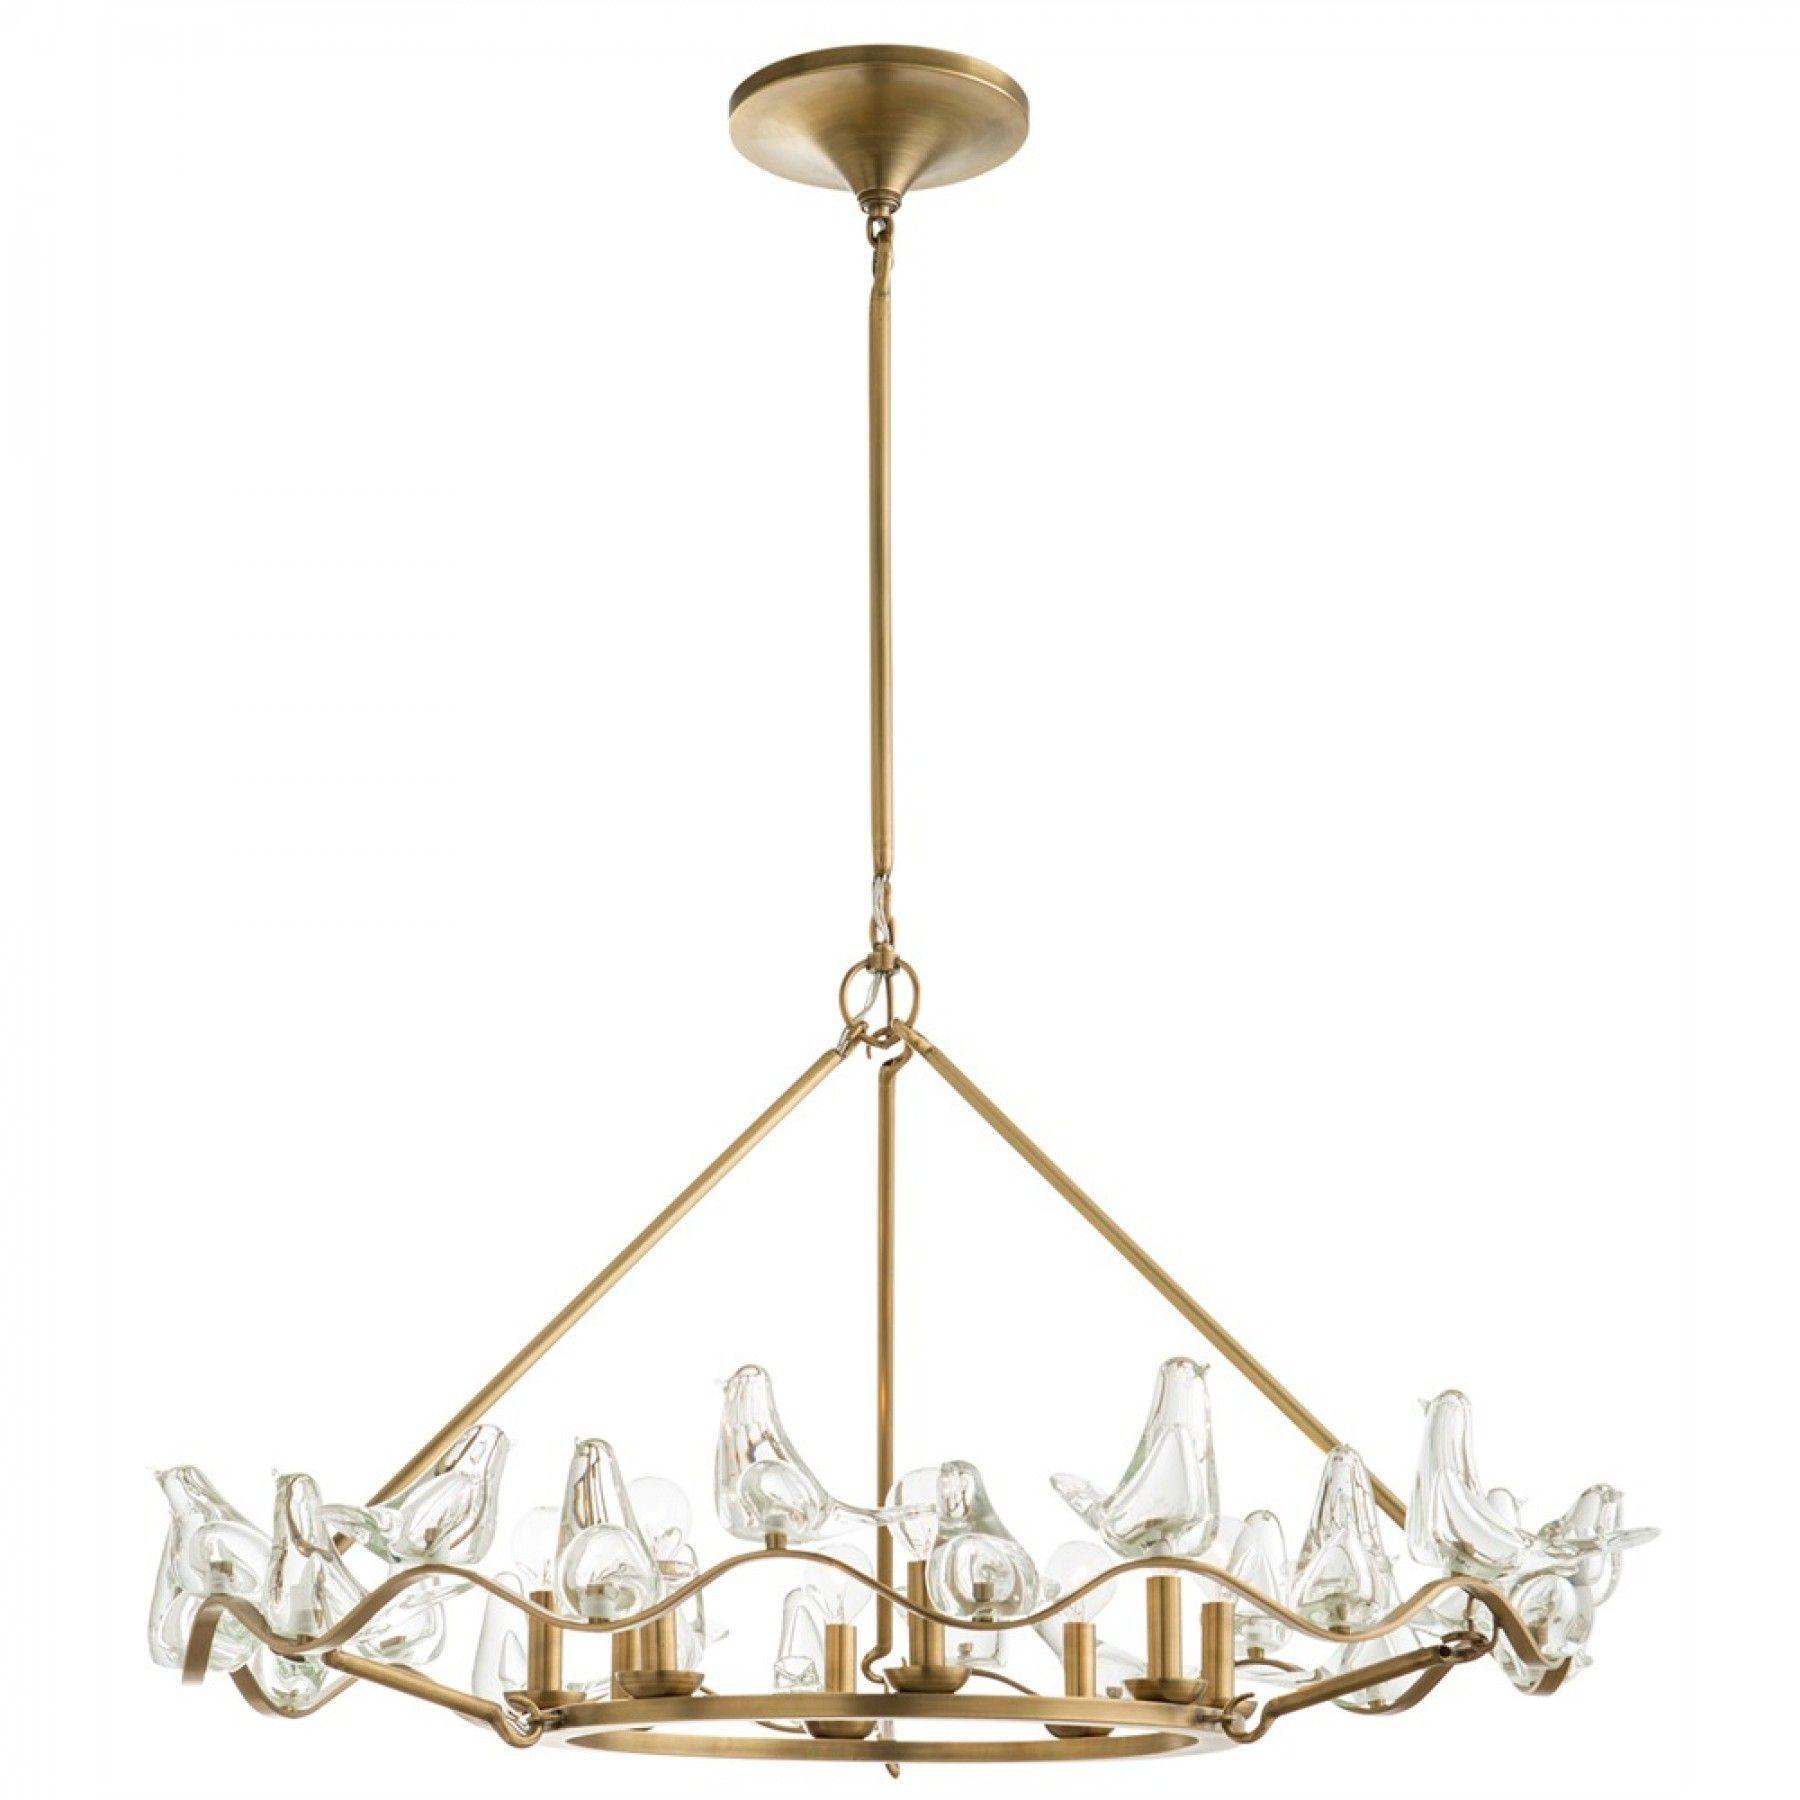 Dove chandelier 23 artres pinterest chandeliers large dove chandelier arubaitofo Image collections